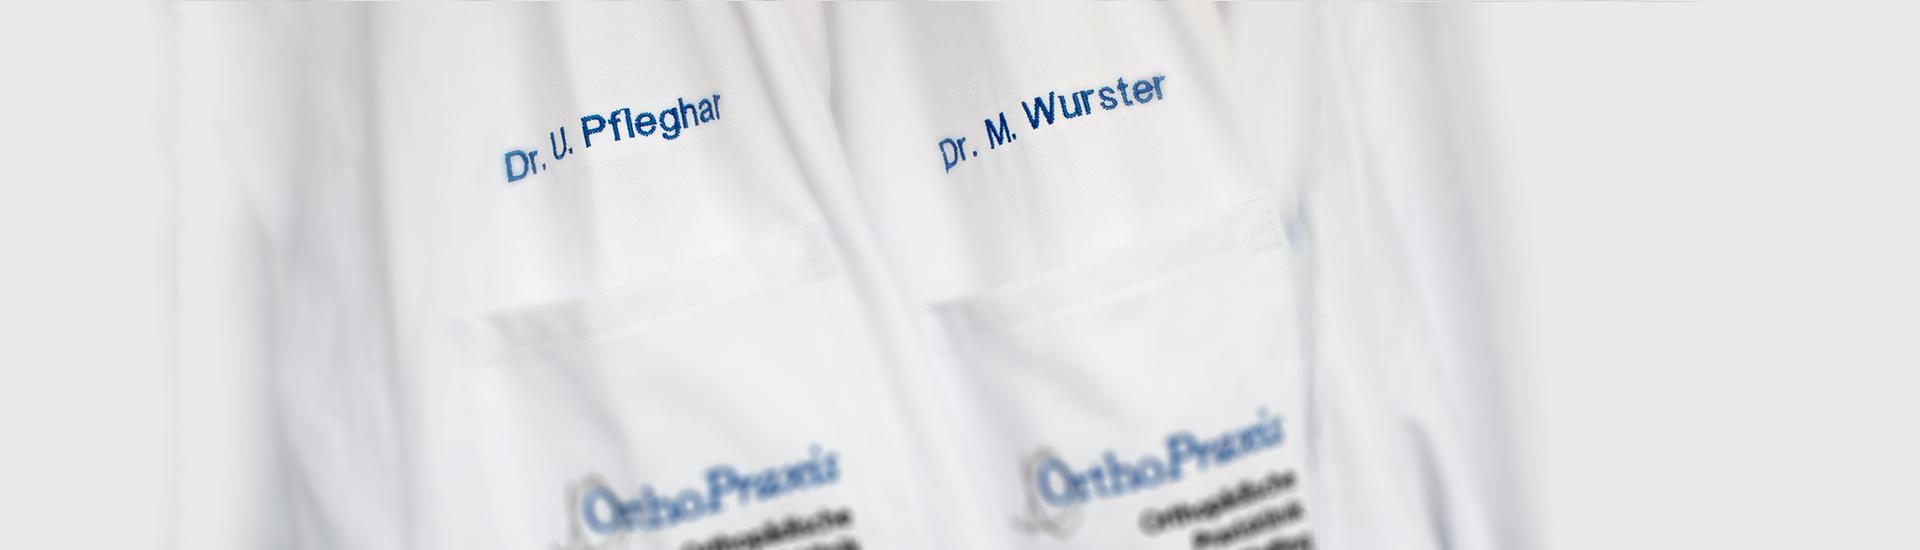 Orthopädie Fachärzte